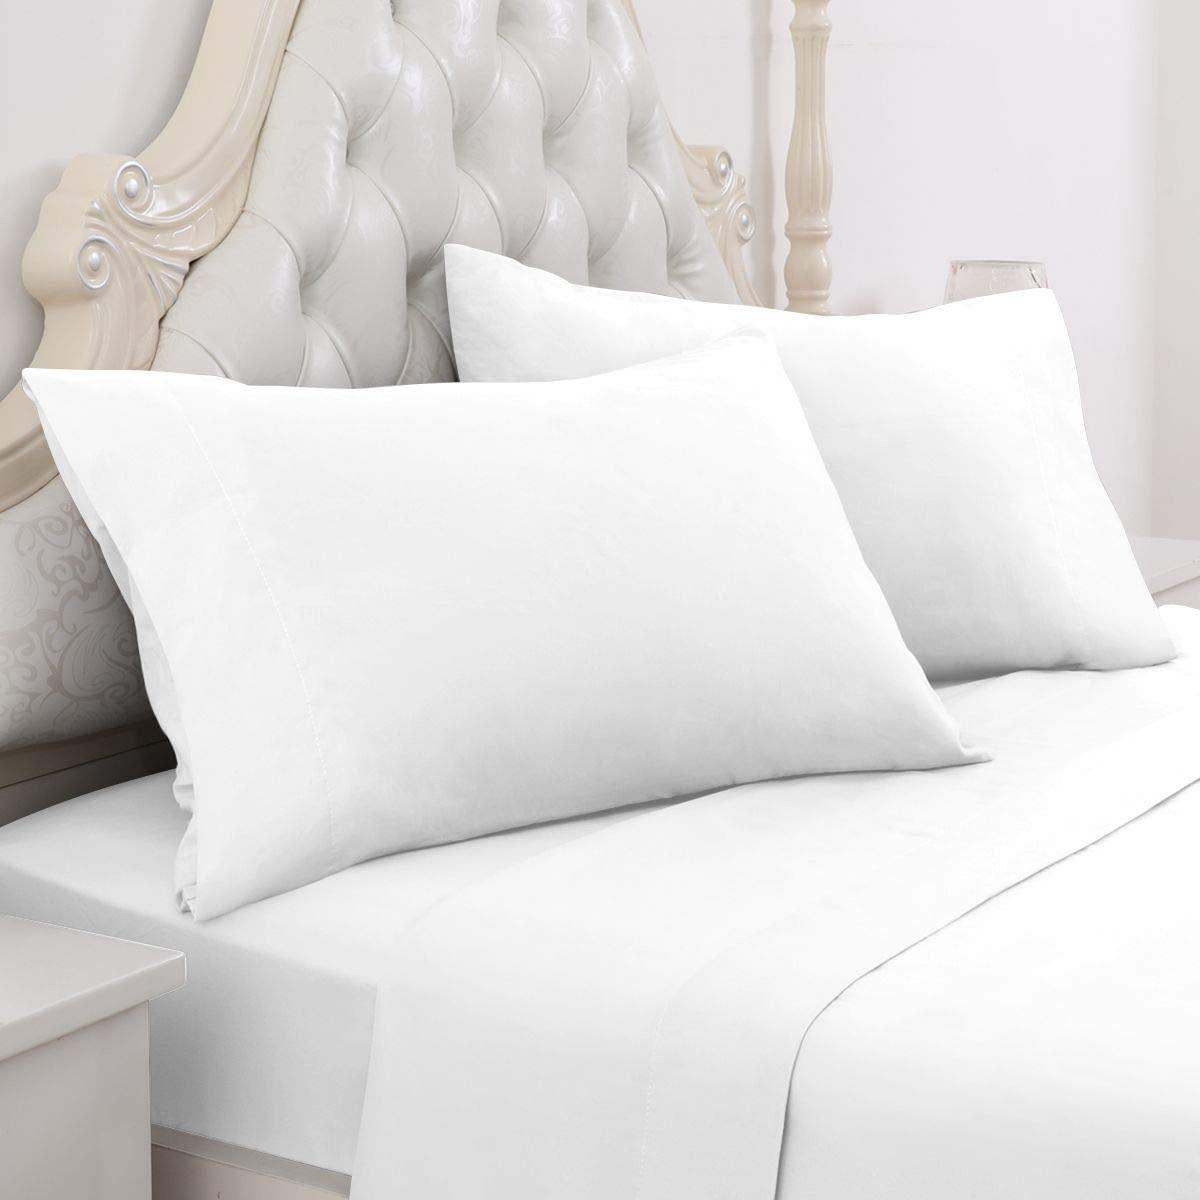 HOMEIDEAS 6 Piece Bed Sheet Set (King, White) 100% Brushed Microfiber 1800 Bedding Sheets - Deep Pockets